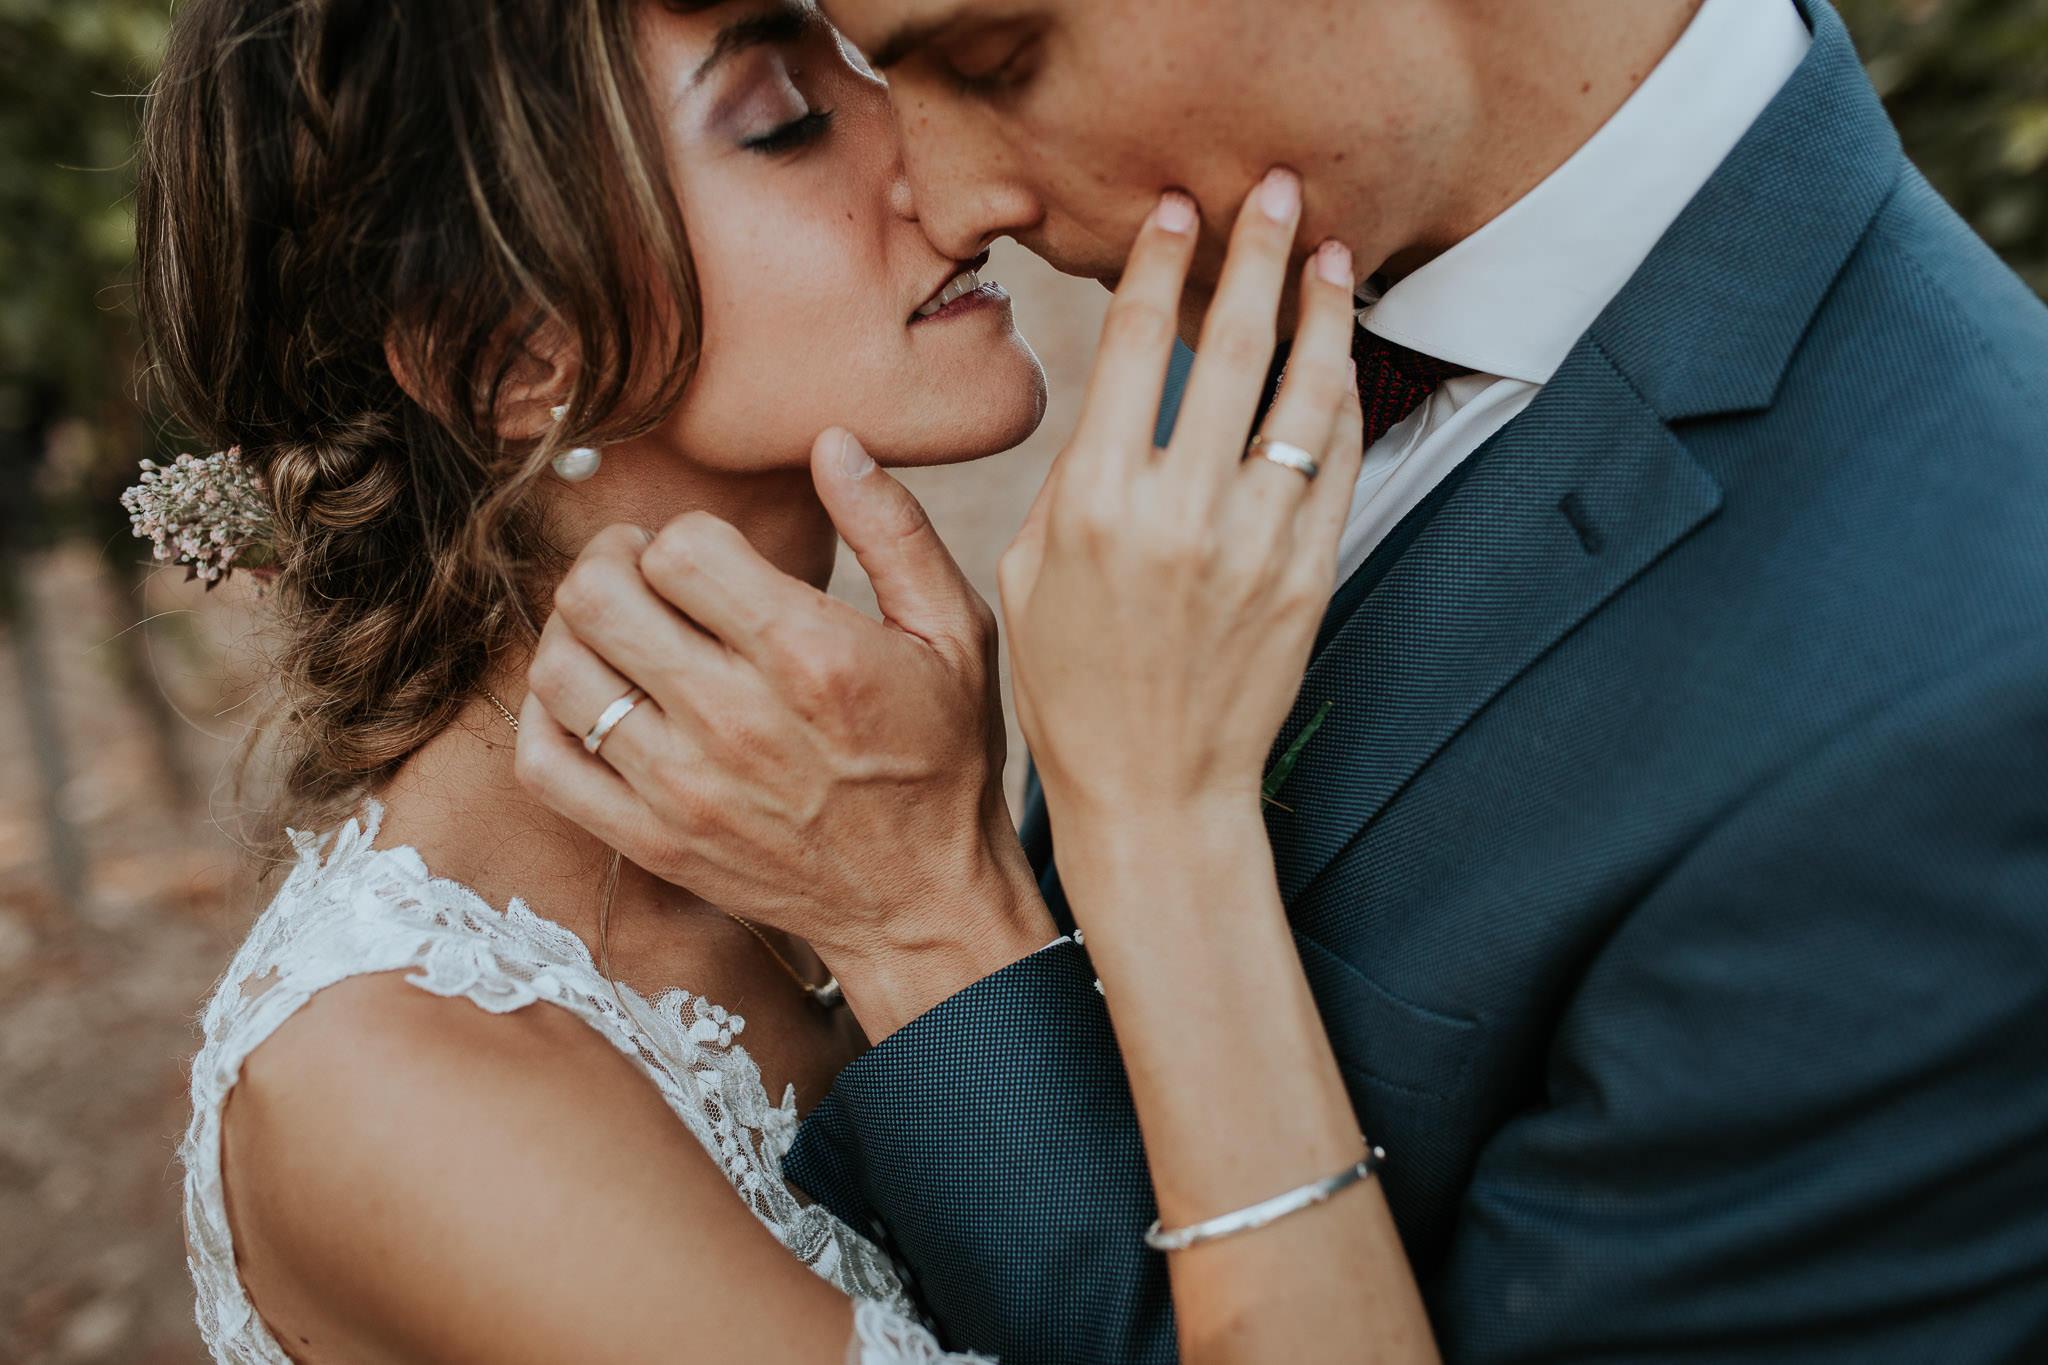 Wedding photographerSpain